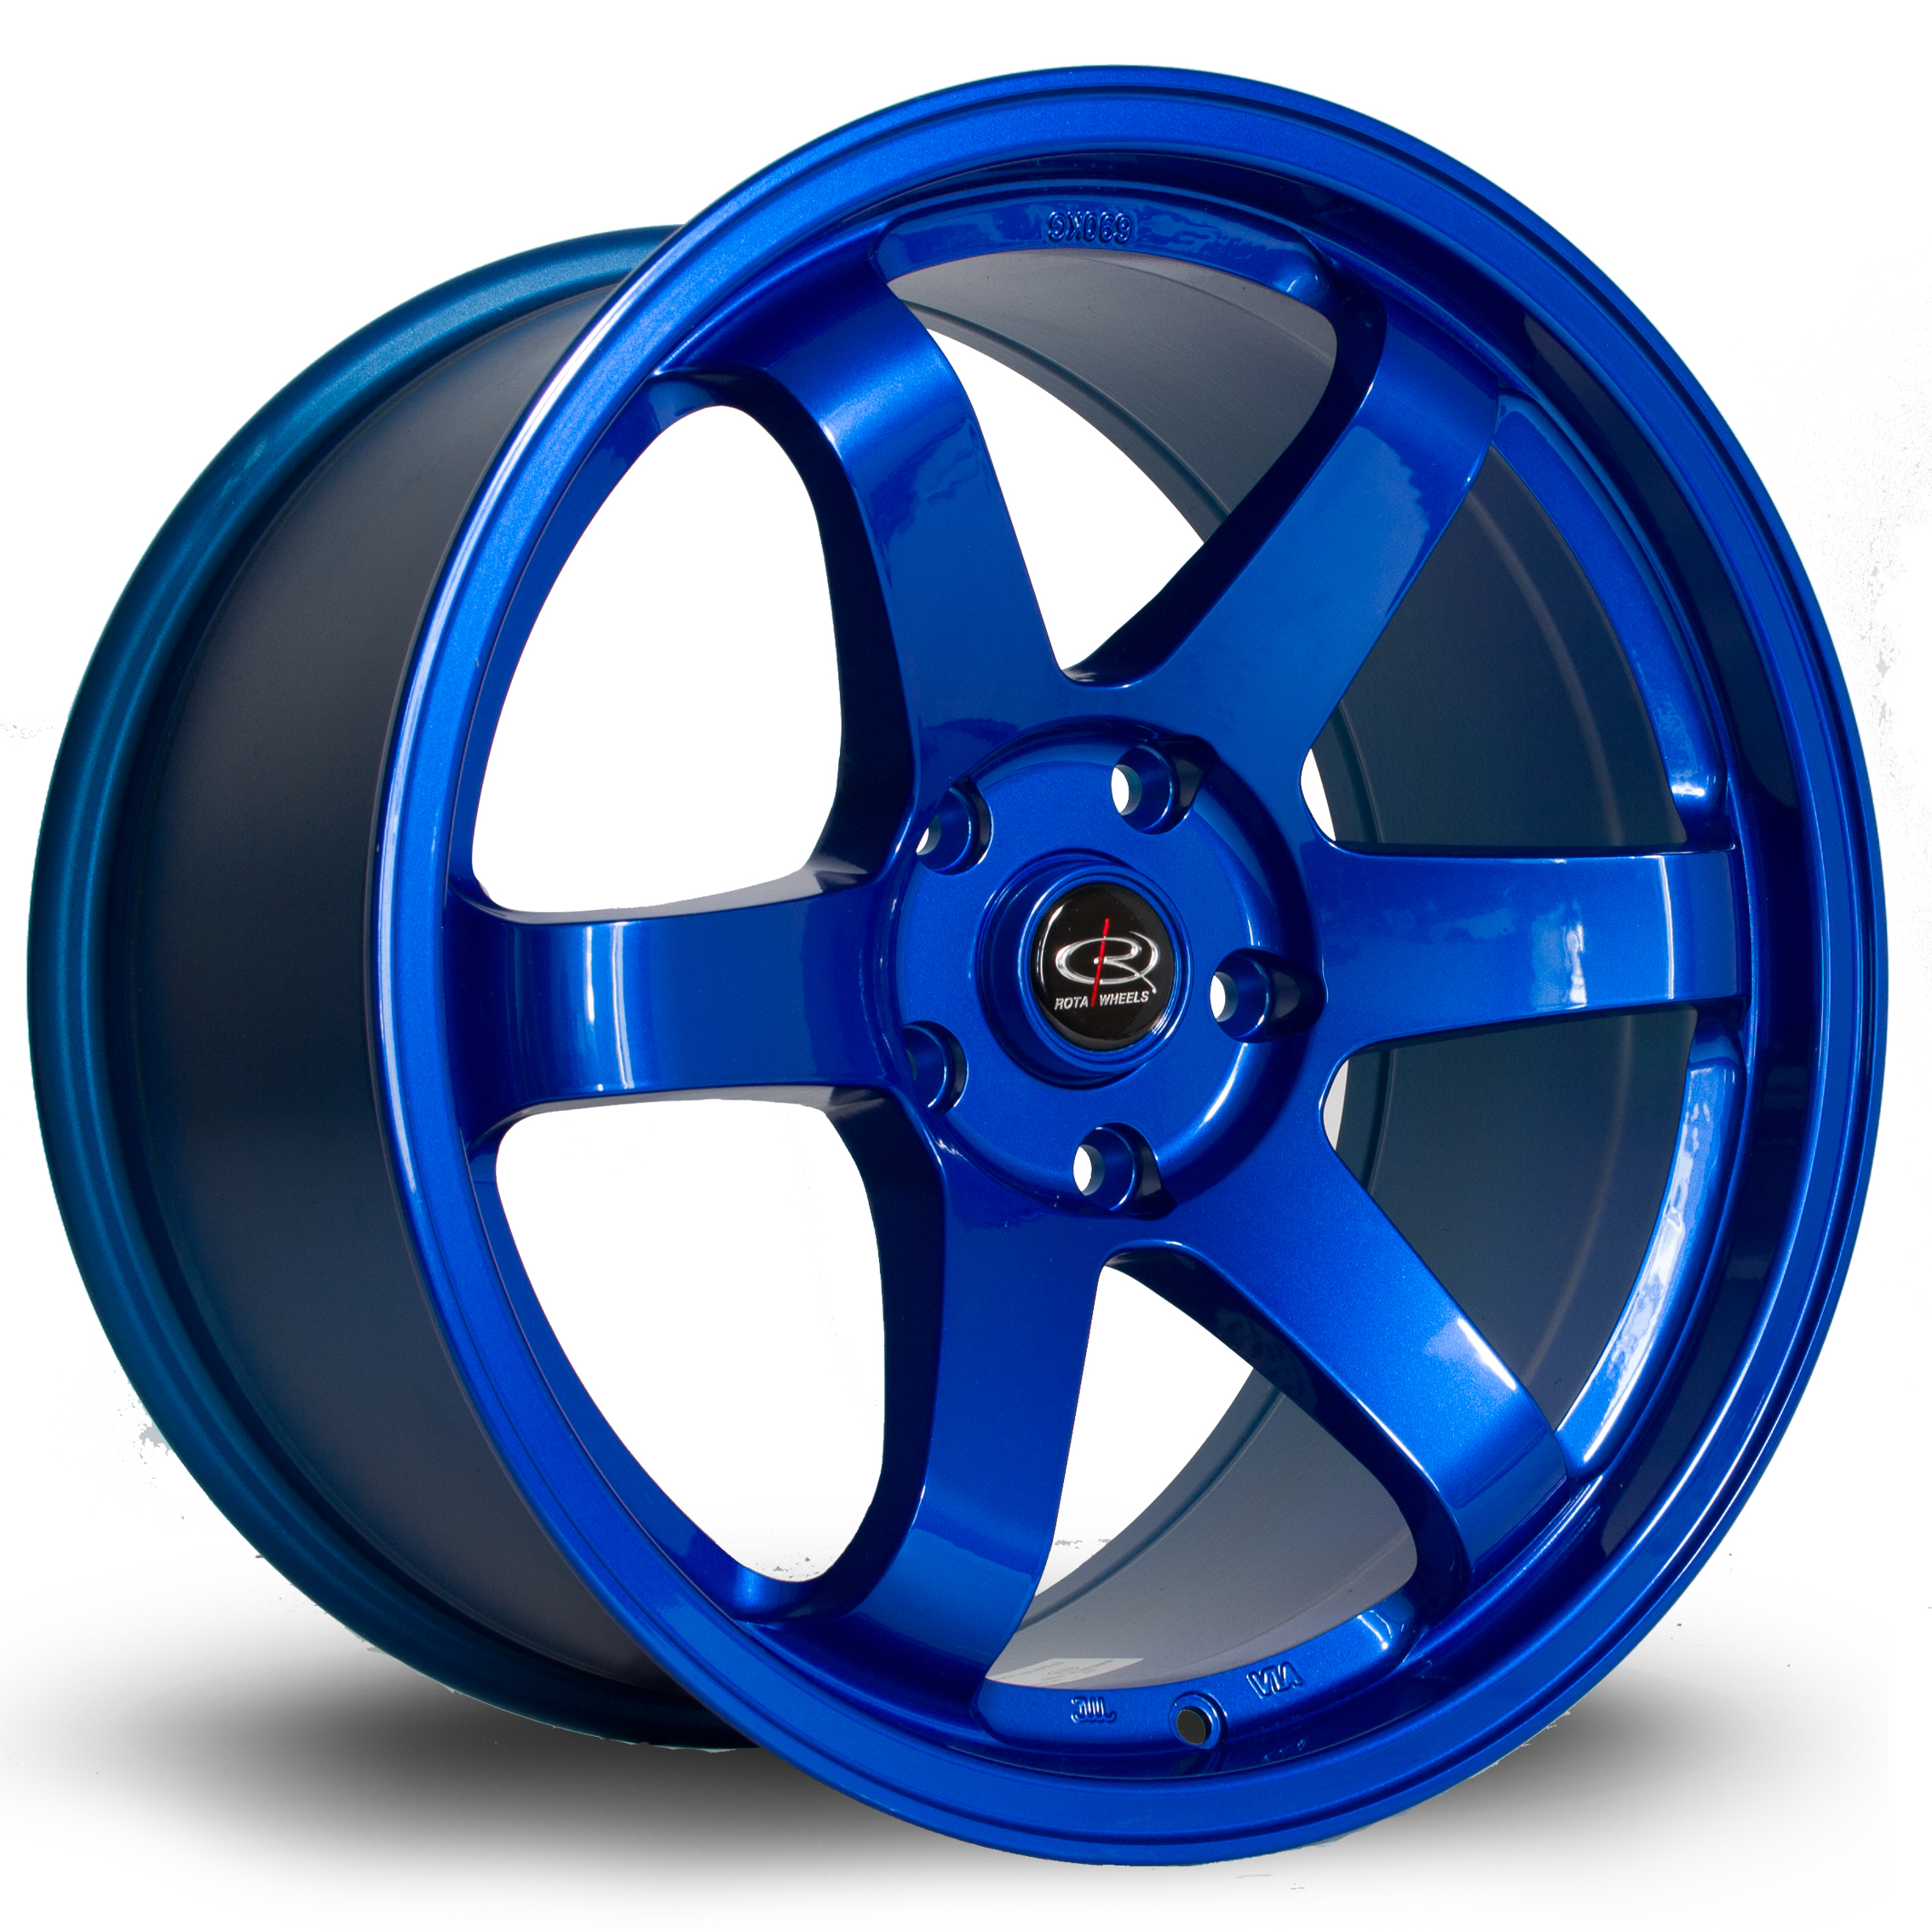 ROTA GRID 9,5x18 5x120 ET35 BLUE